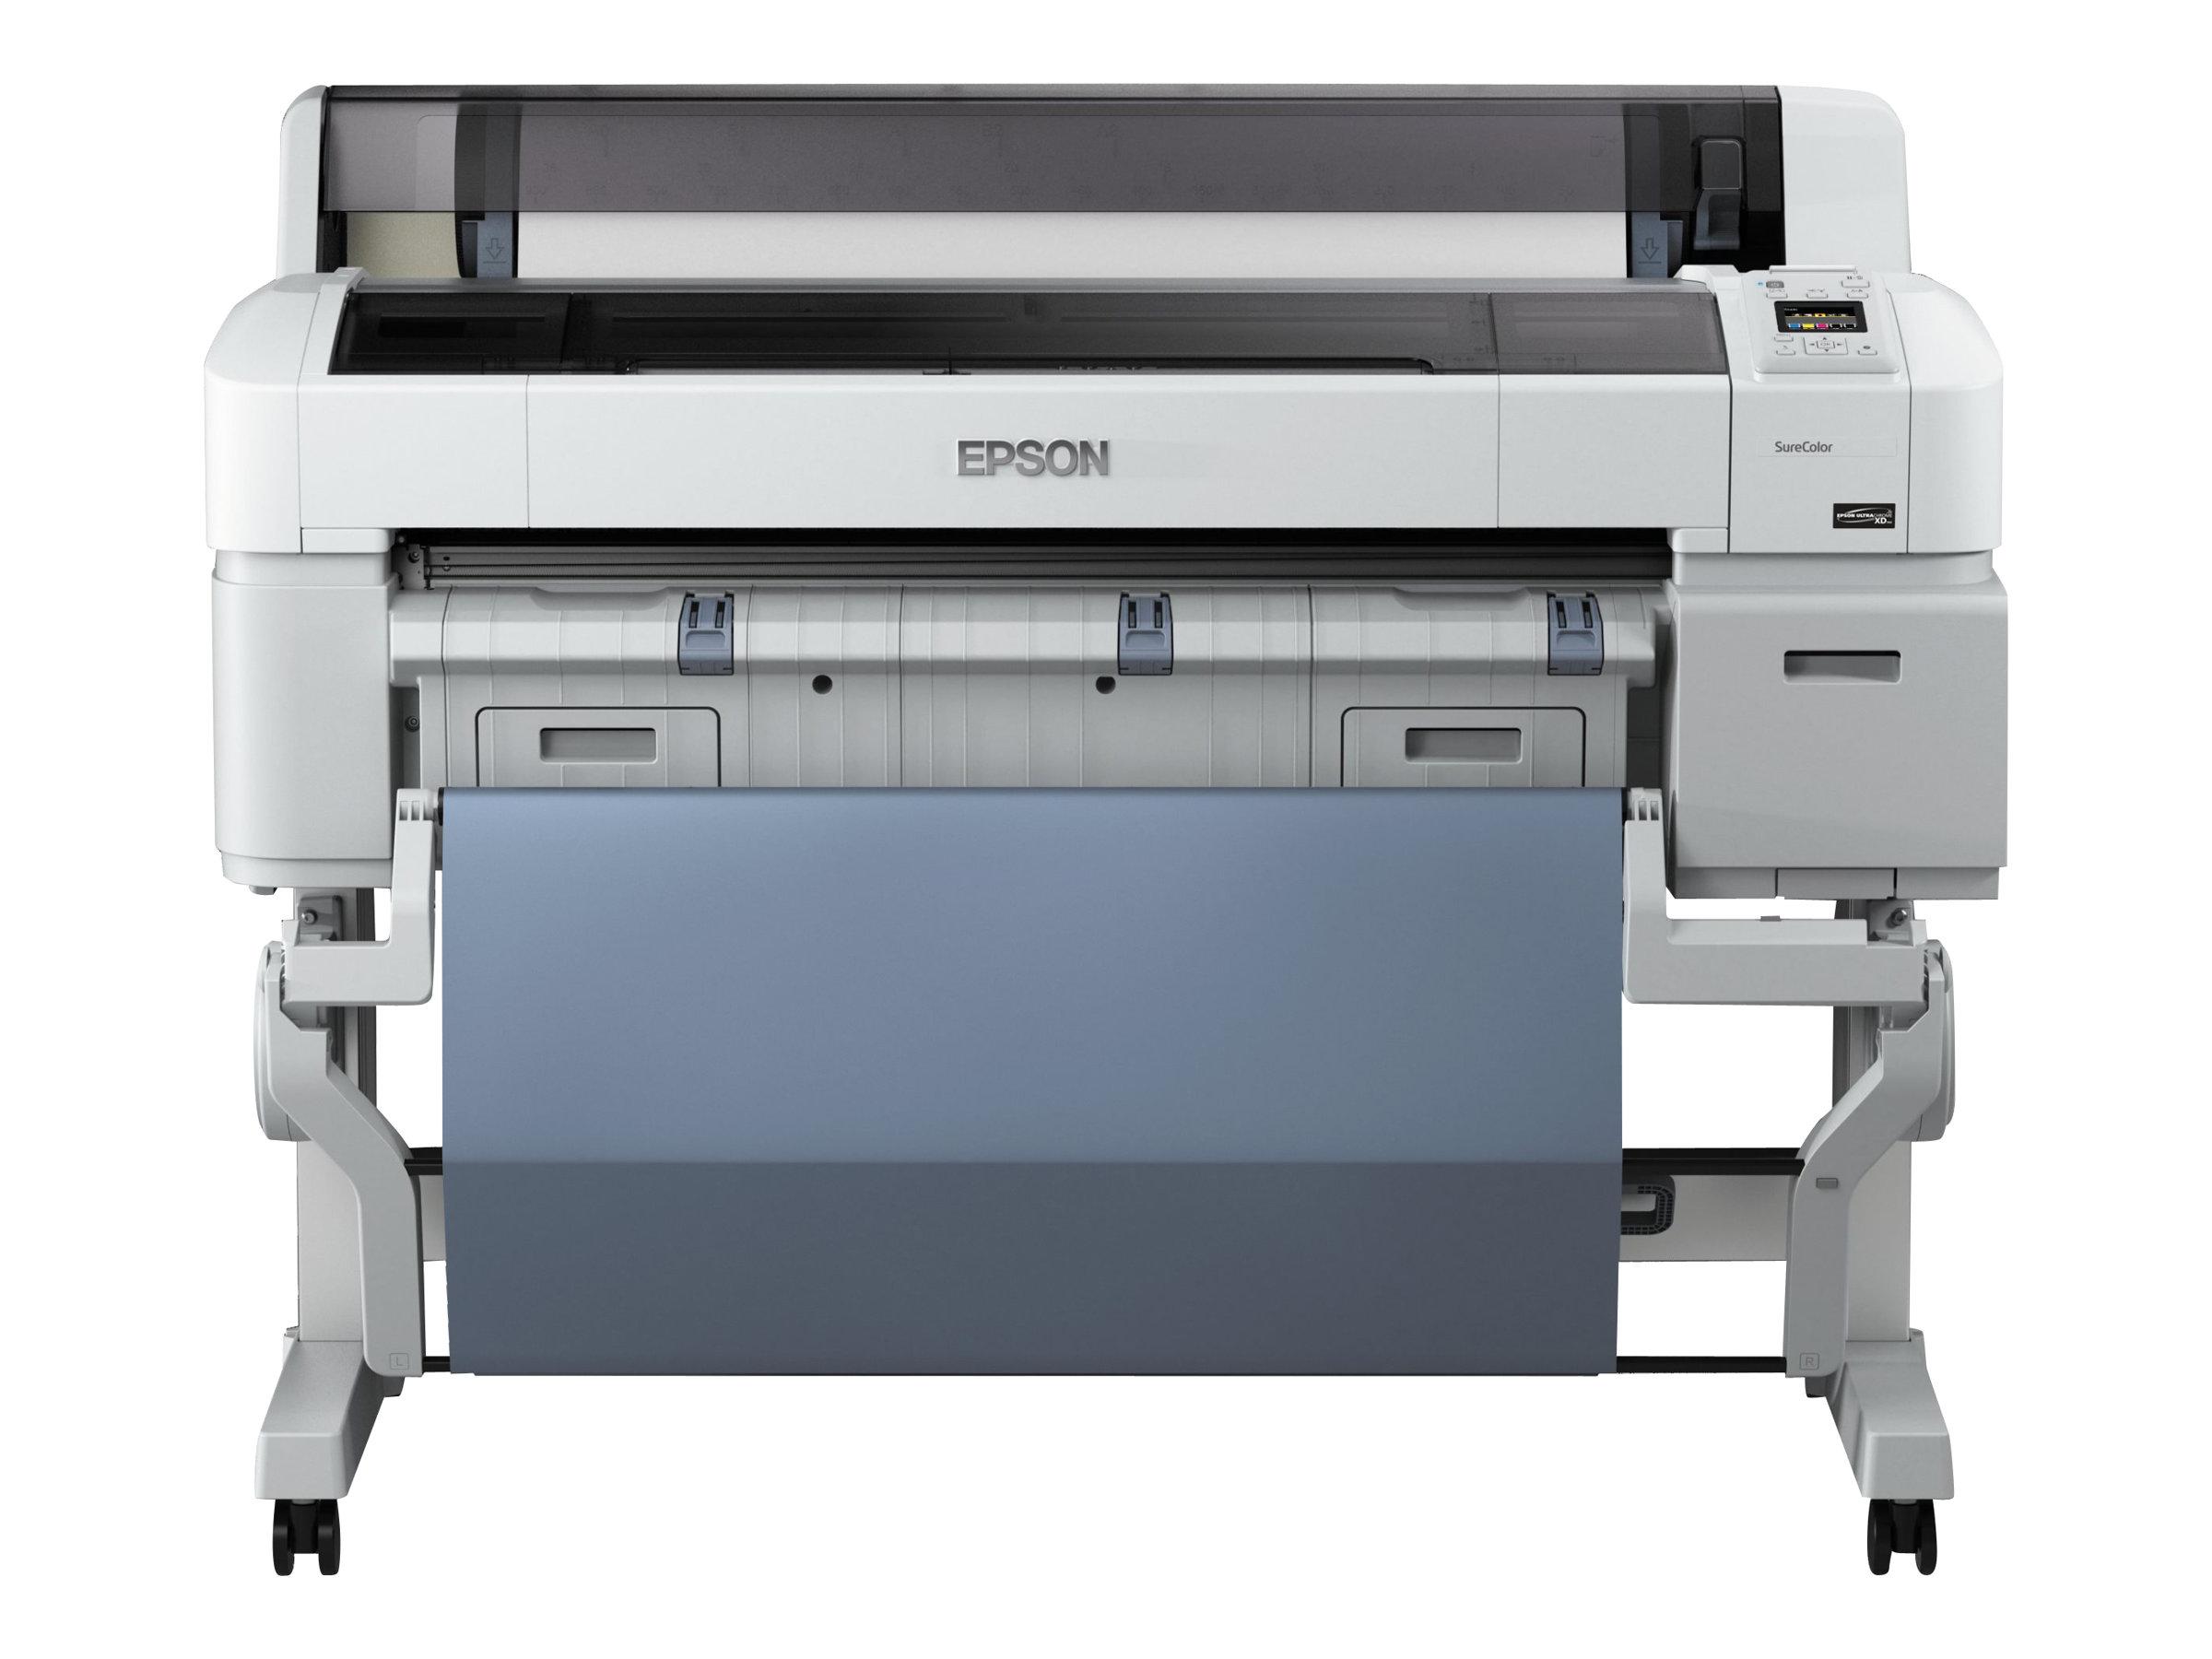 Epson SC-T5200 Großformatdrucker